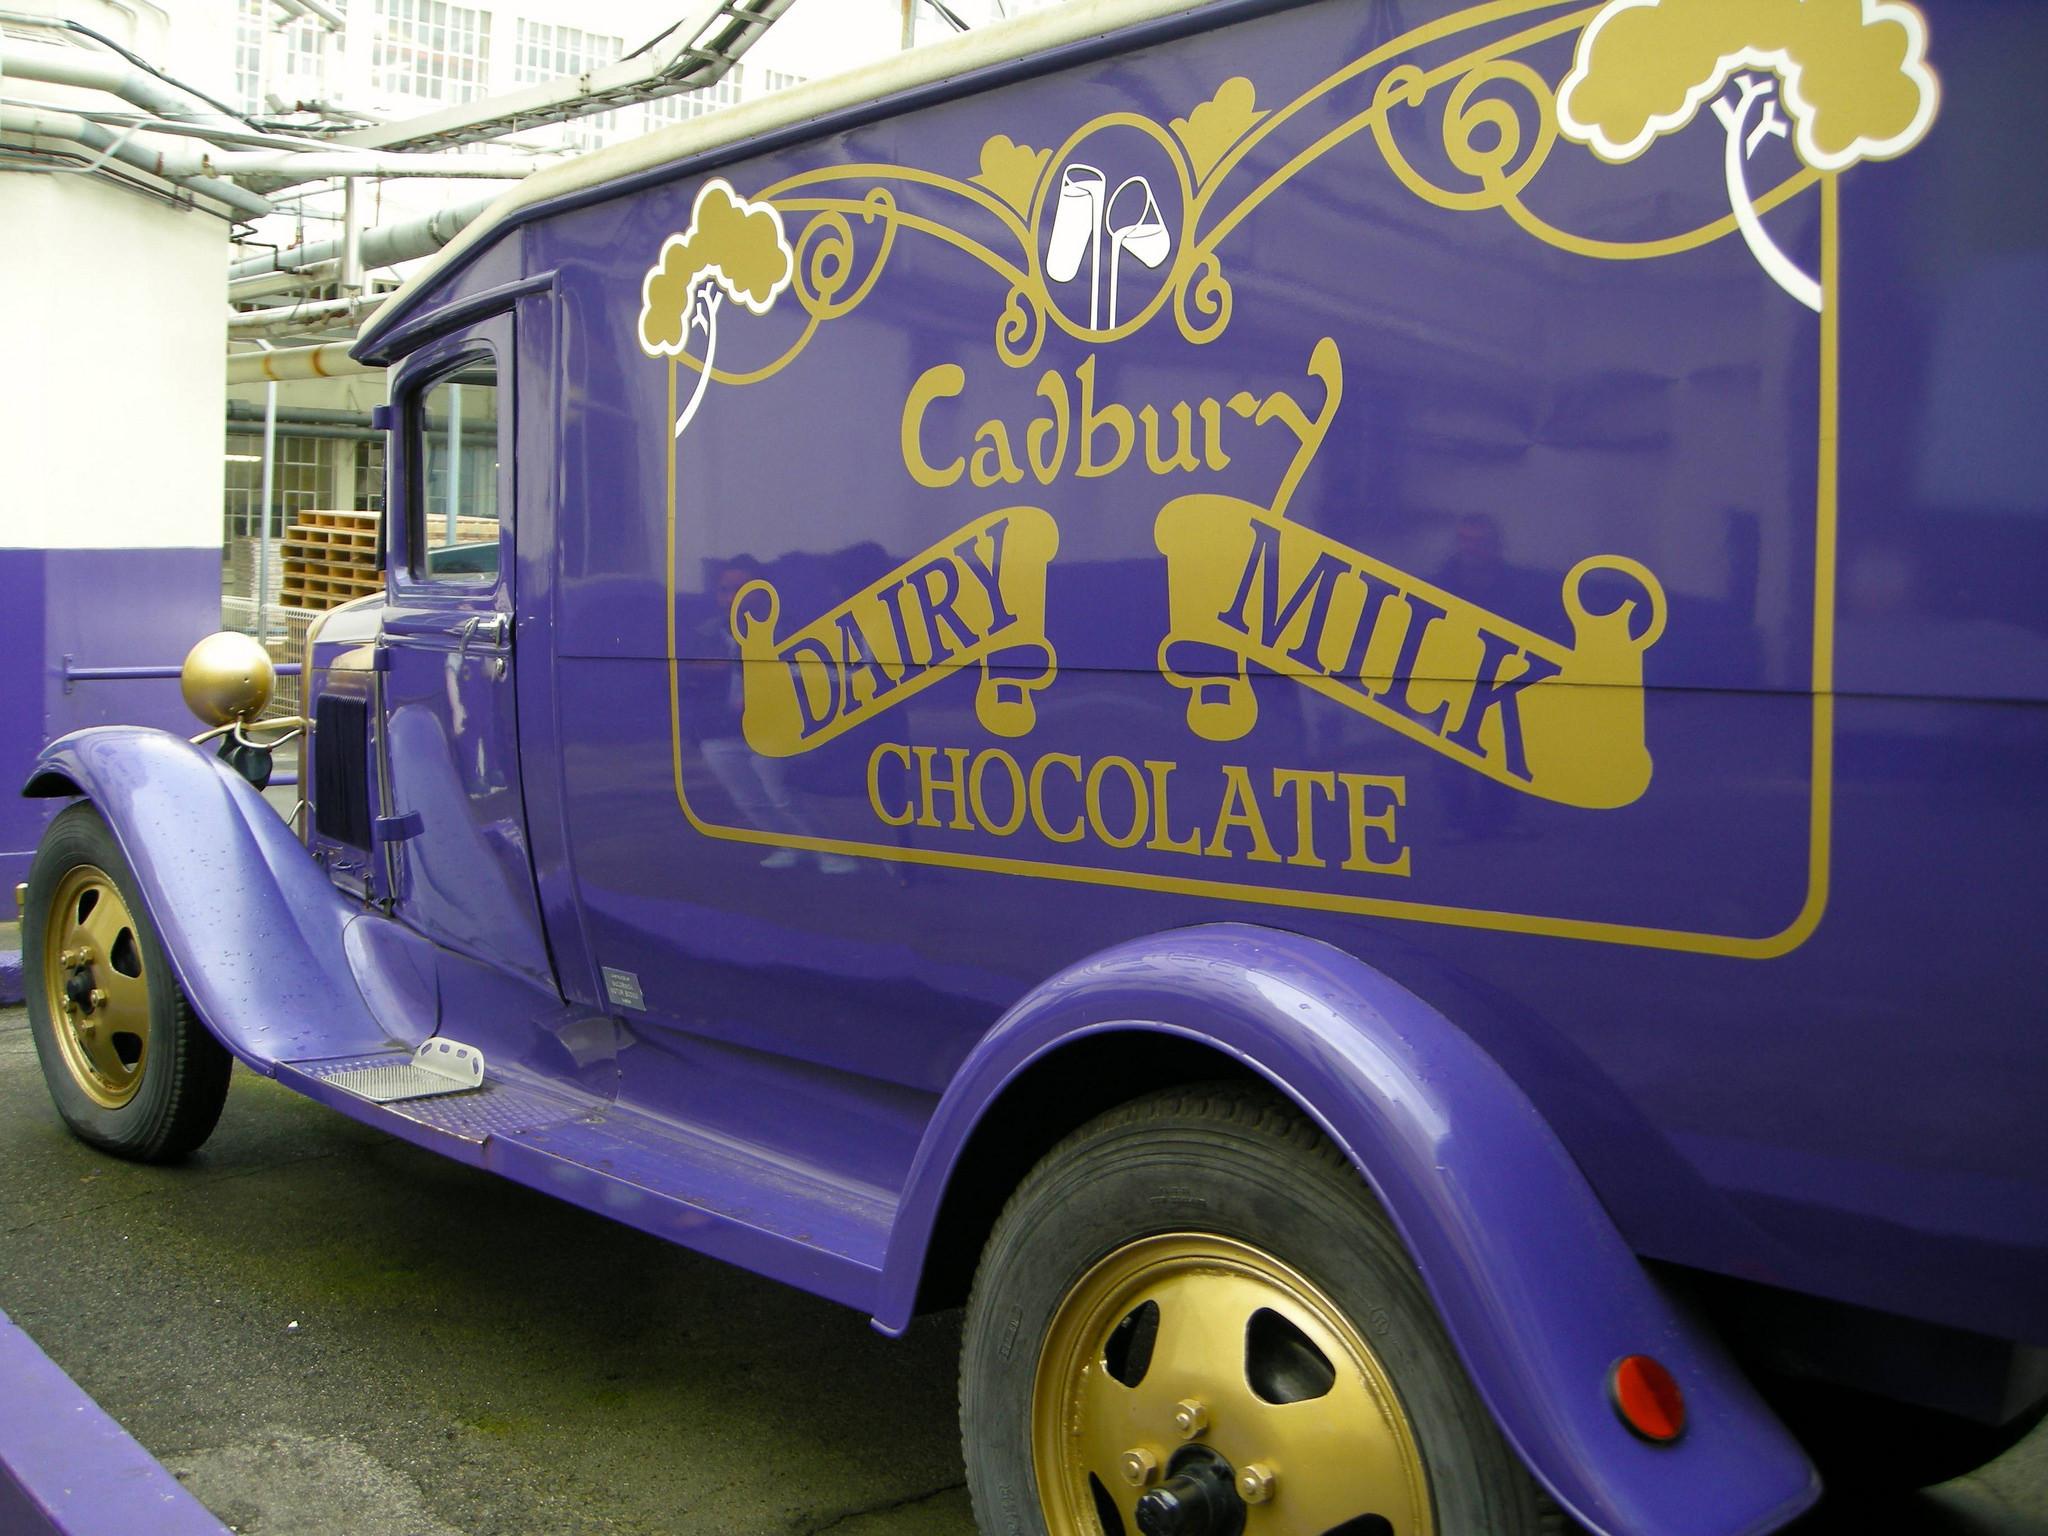 Get your cocoa fix at Cadbury World